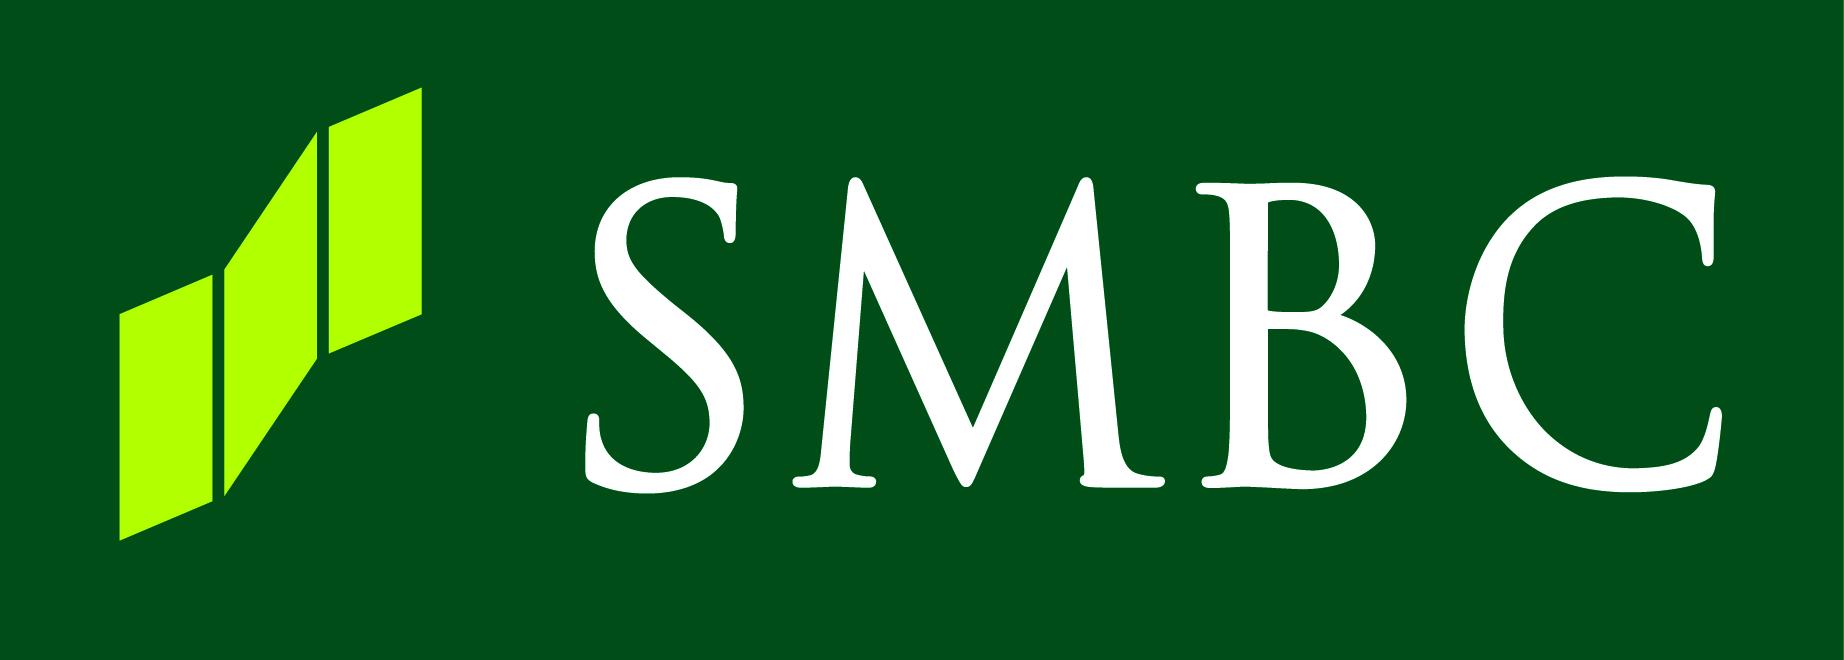 smbc-logo-only-1-CMYK